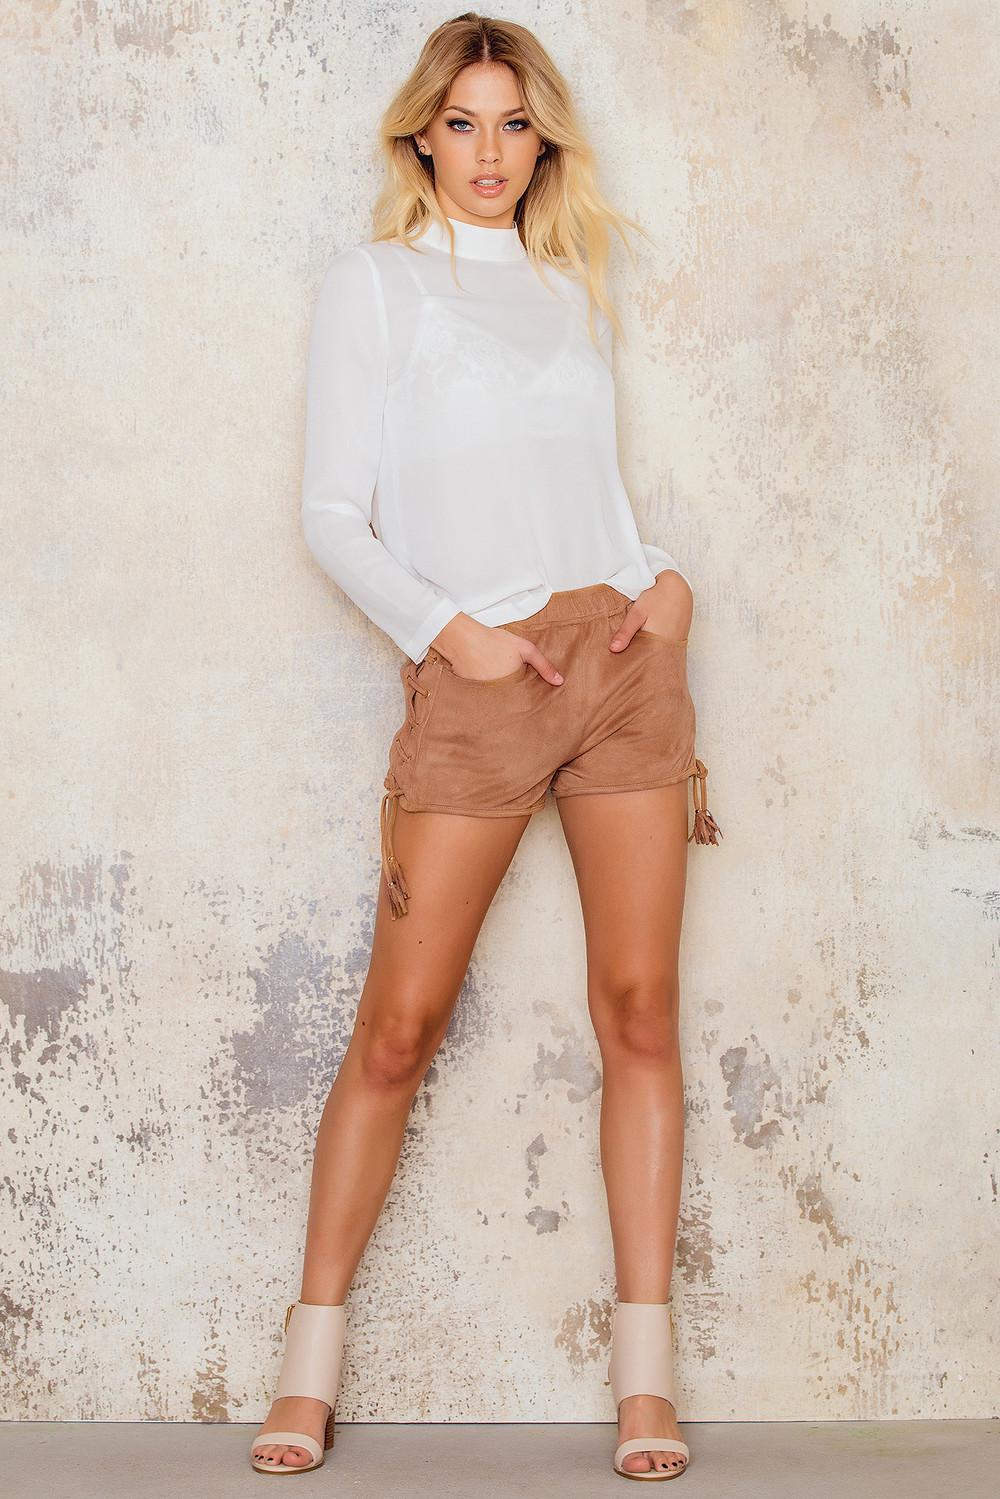 Sally & Circle Louisiana shorts